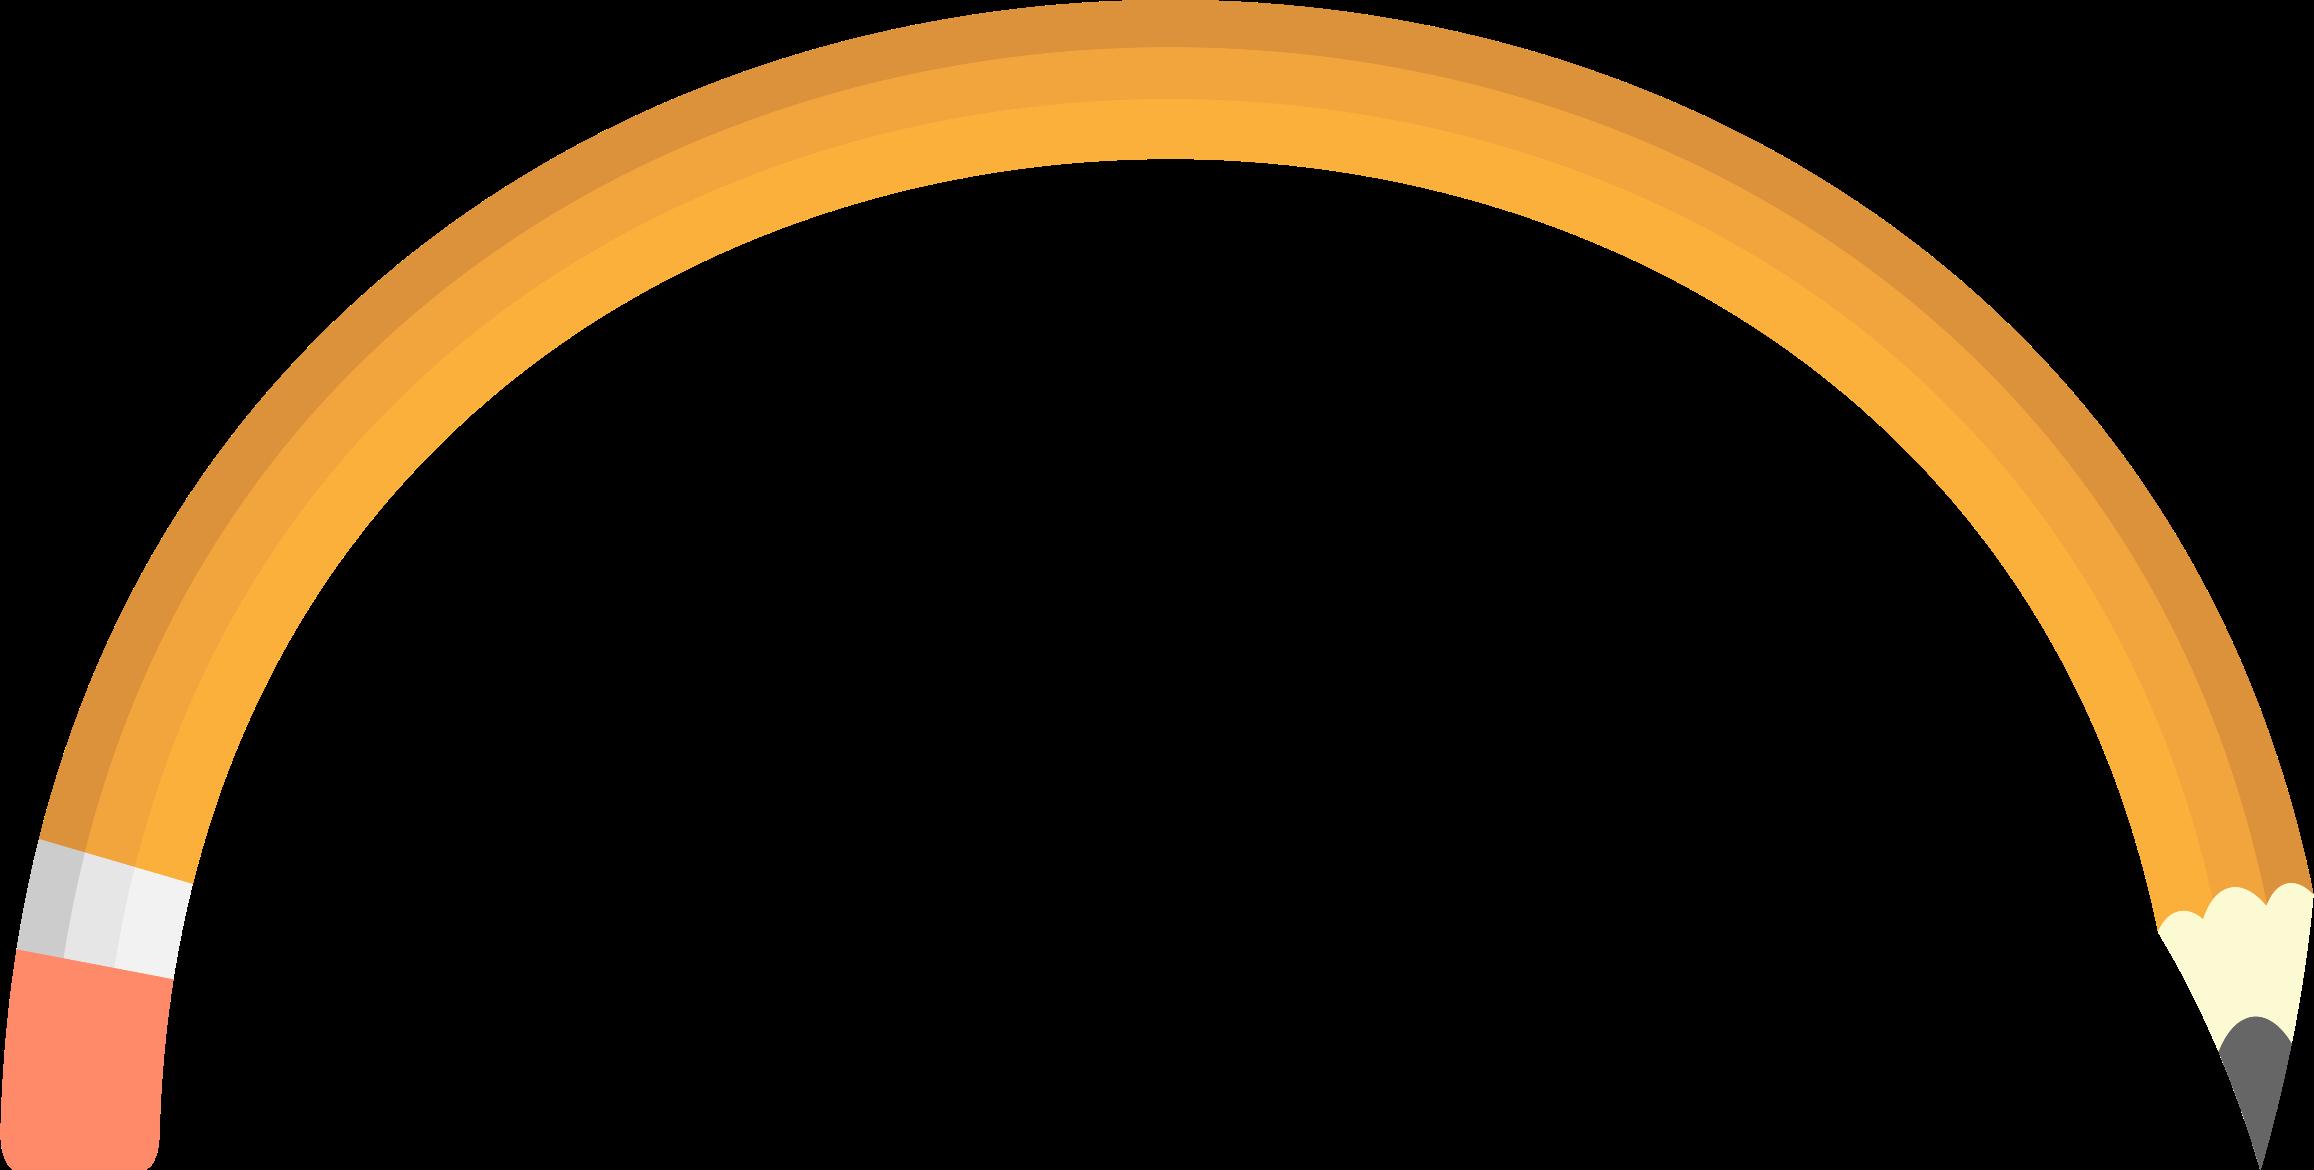 Arch. Clipart pencil circle